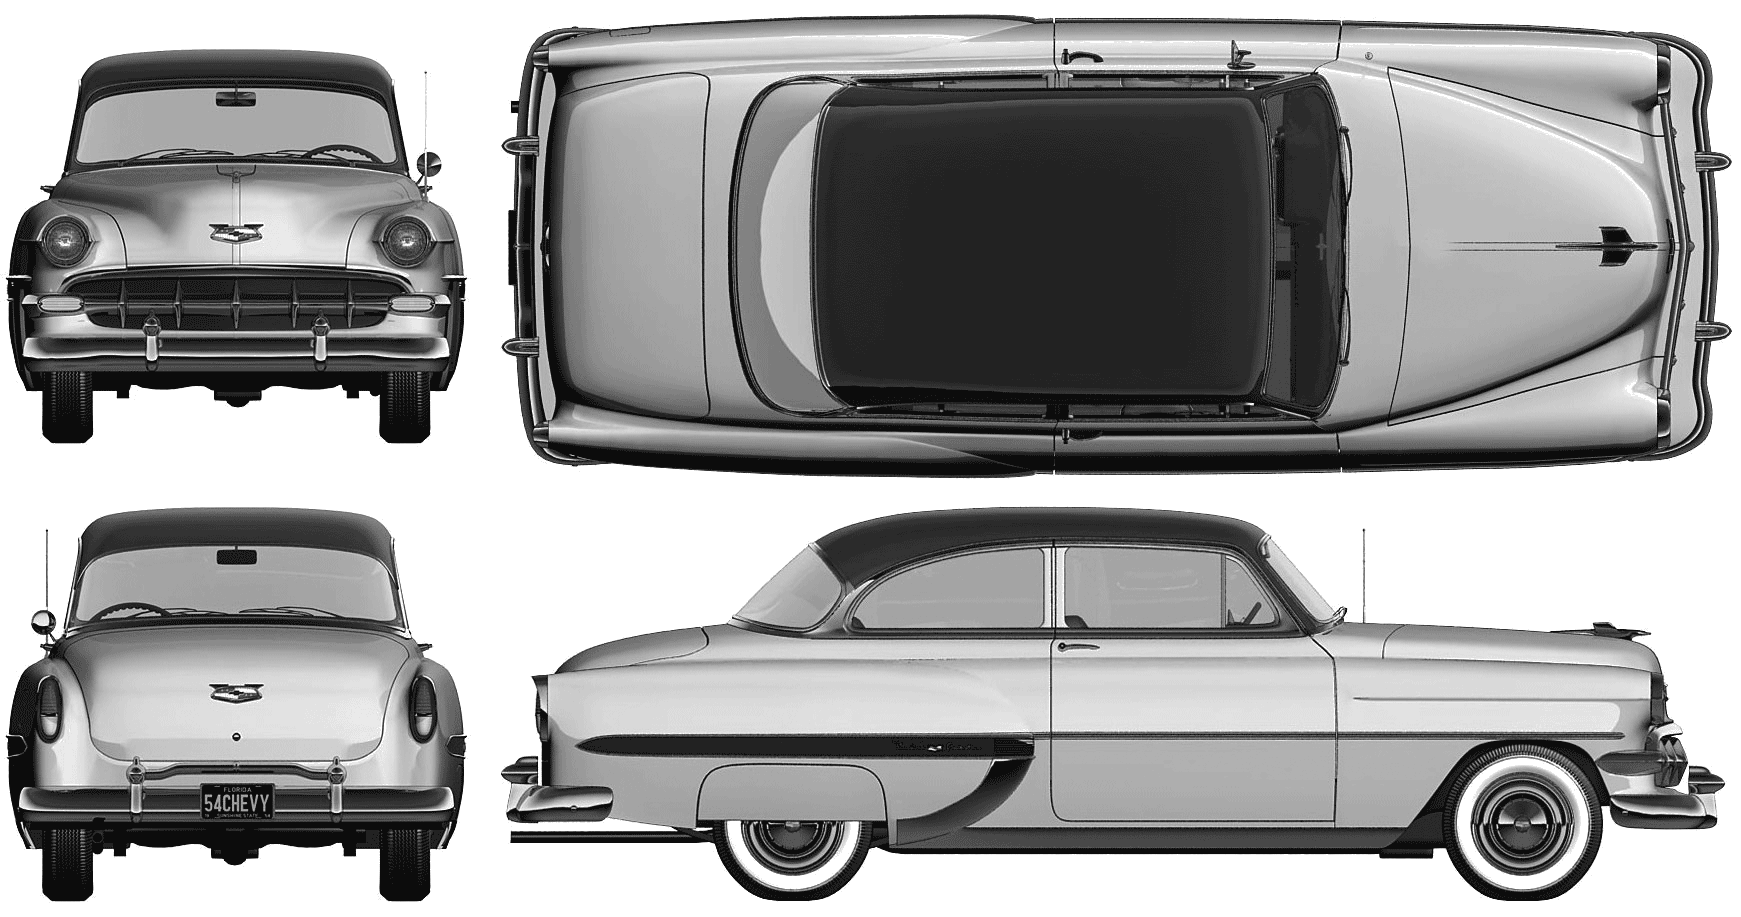 1954 Chevrolet Bel Air 2 Door Sedan Blueprints Free Outlines Chevy